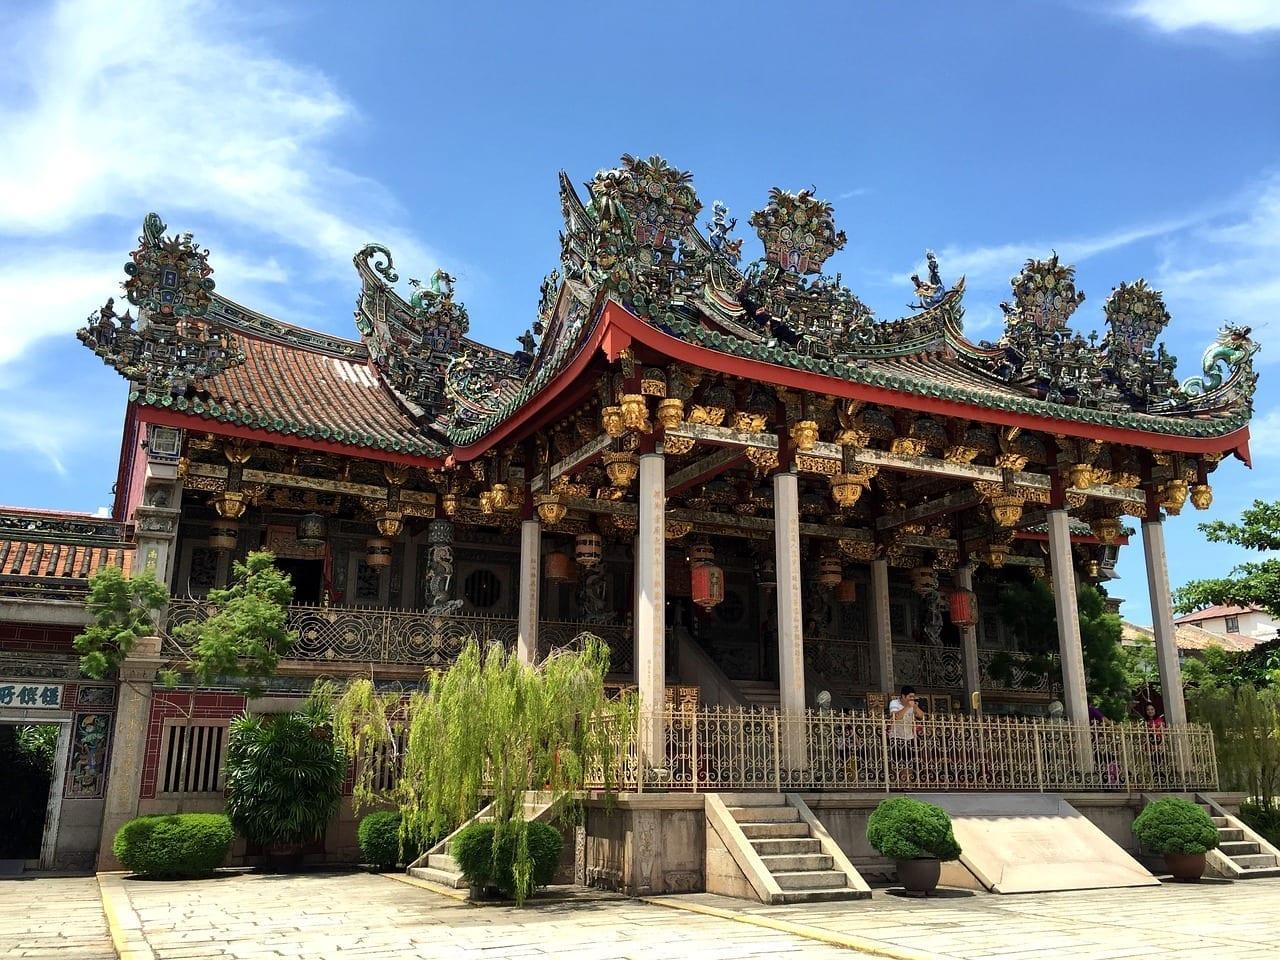 Khoo Kongsi Chino Clan Casa Penang Malasia